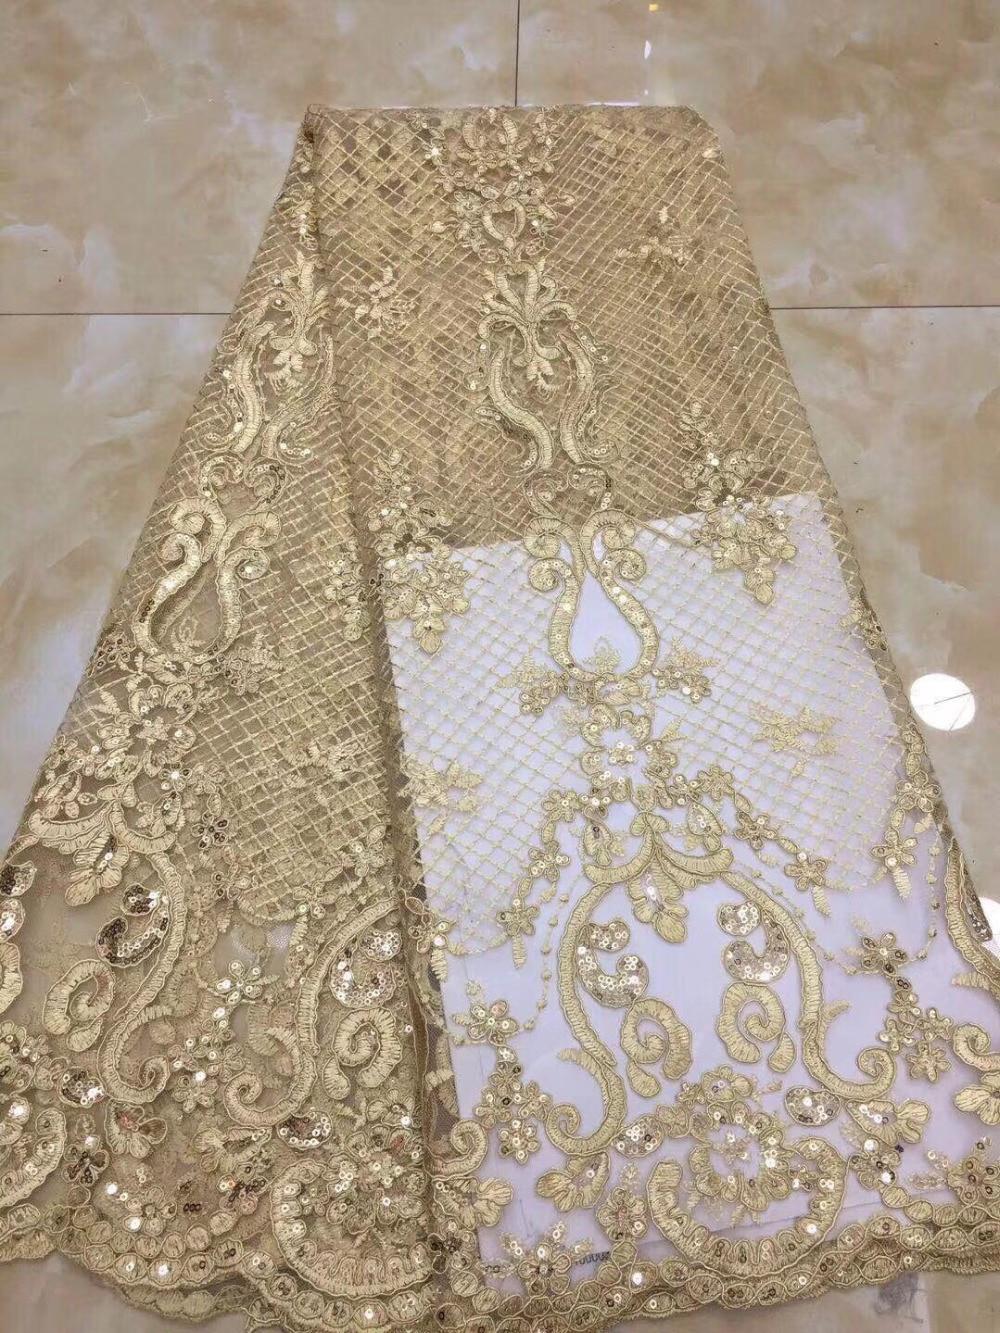 2018 Mode Afrikaanse Kant Stof Goud Pailletten Materialen Franse kant Nigeriaanse Tule Kant Stof Voor Wedding Party Dress AFFJF118-in Kant van Huis & Tuin op  Groep 1